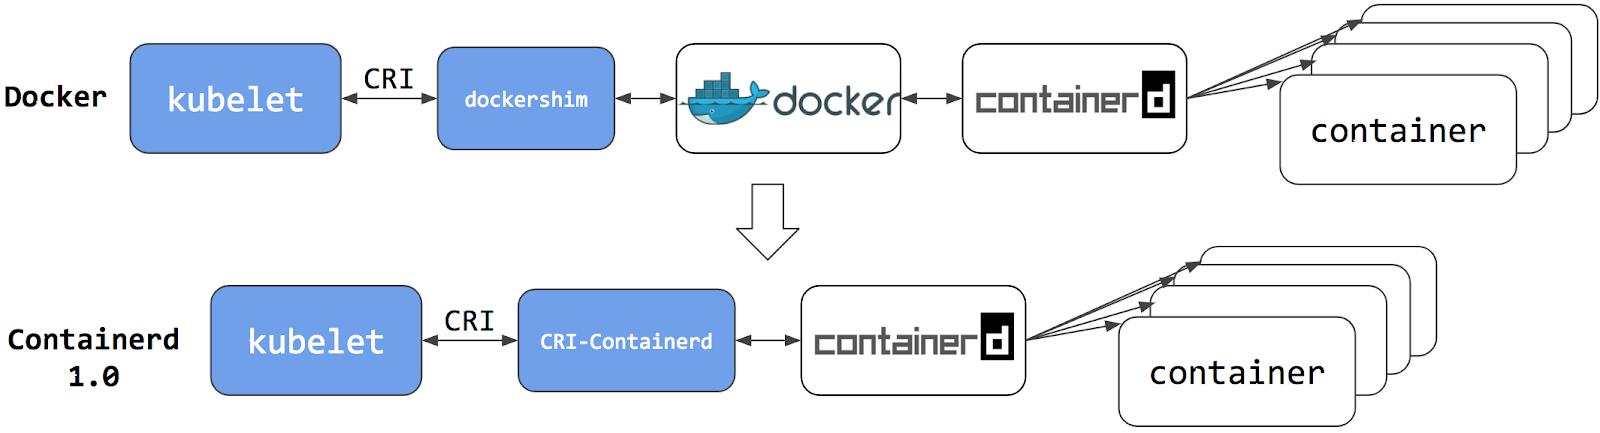 Интеграция containerd с Kubernetes, заменяющая Docker, готова к production - 2